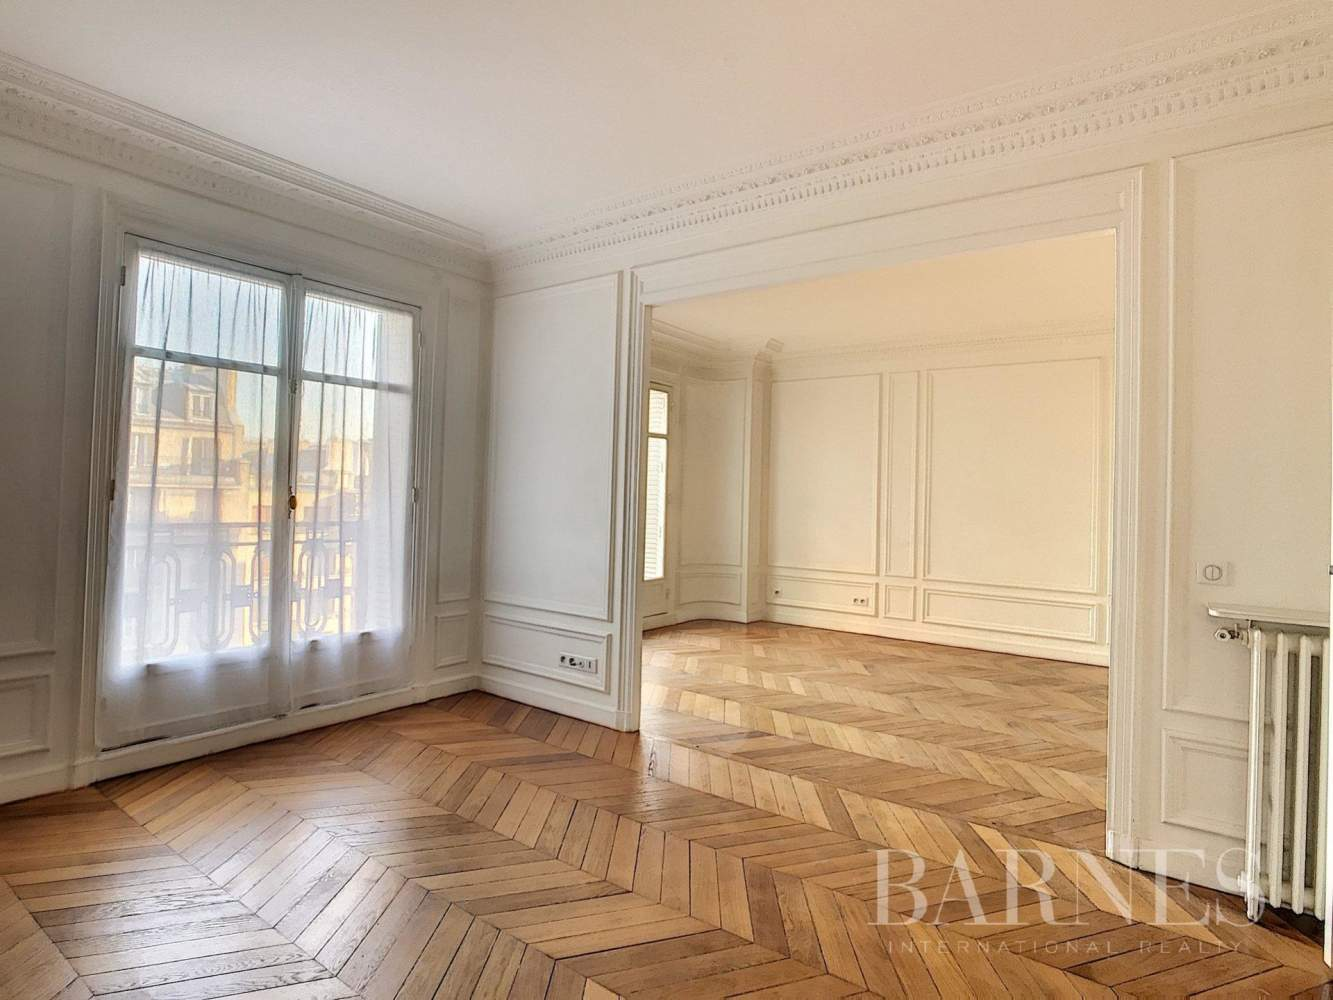 Neuilly-sur-Seine  - Appartement 5 Pièces - picture 1